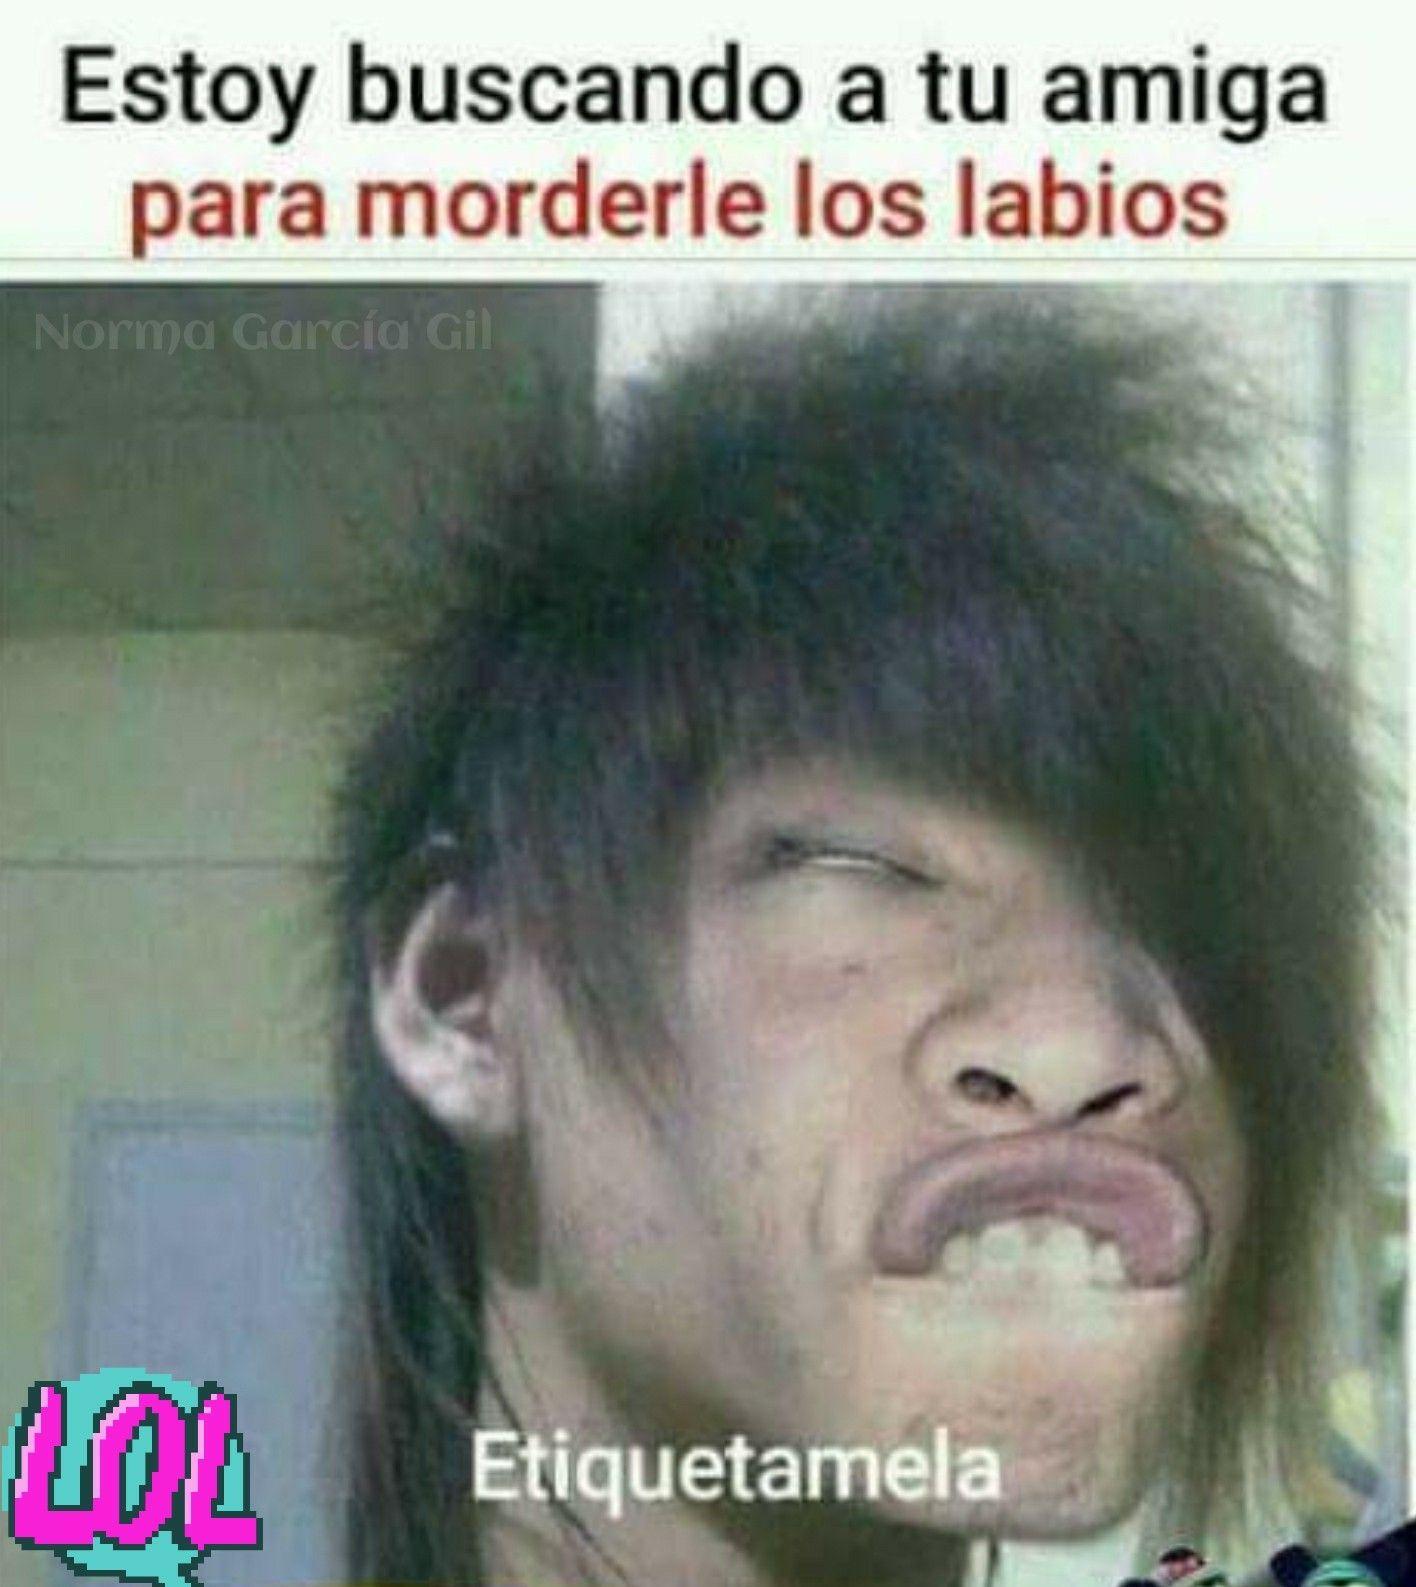 Pin De Norma Garcia Gil En Memes Bromas Y Chistes Bromas Viejitos Chistes